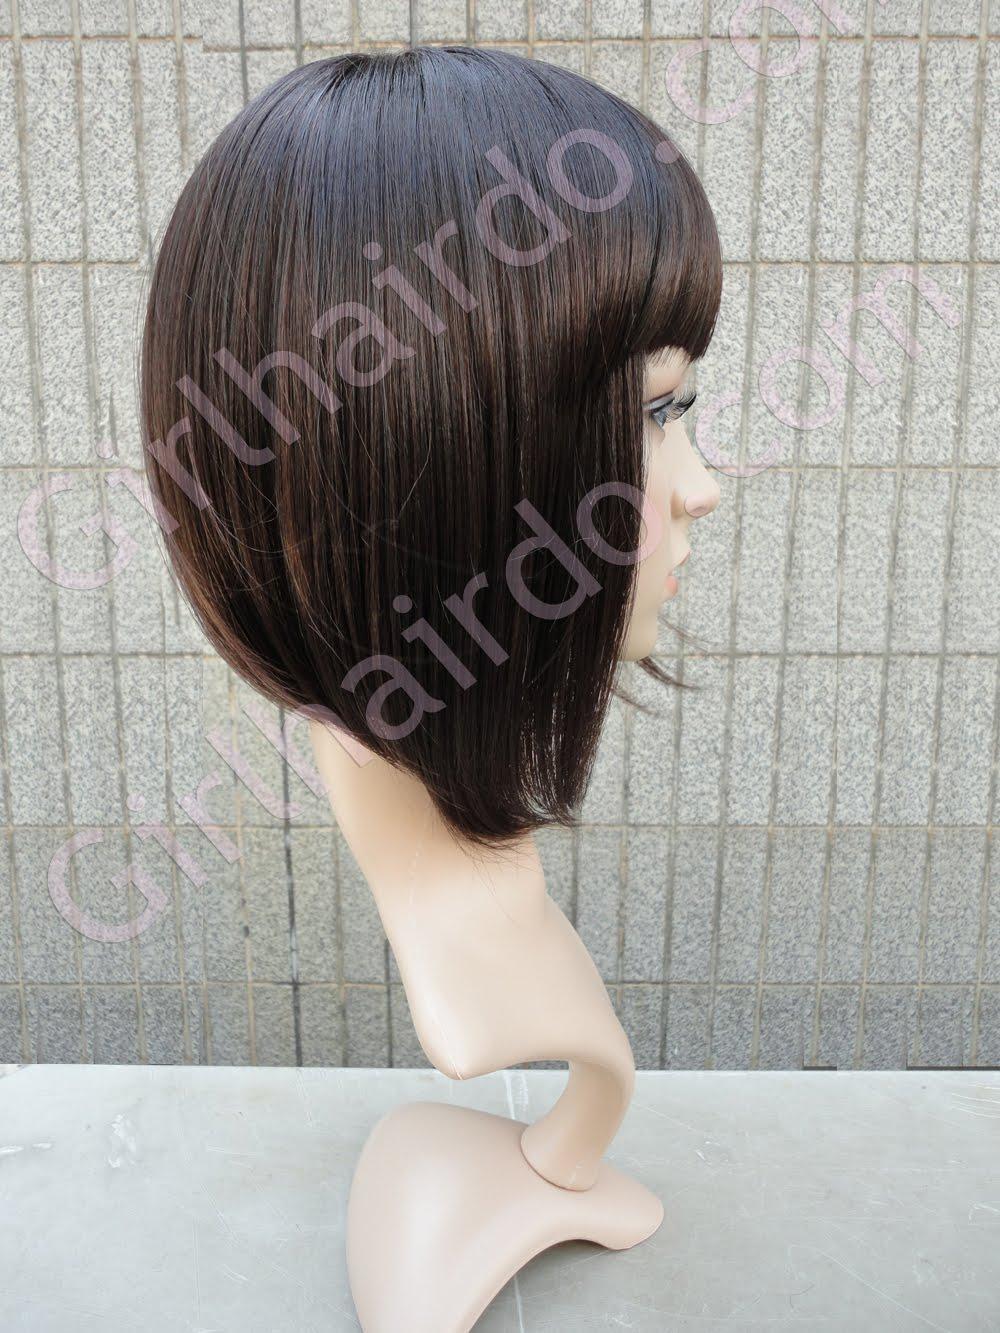 http://2.bp.blogspot.com/_L75C8J4IZqQ/TTlajku8icI/AAAAAAAAANQ/hkHlSvQt1Tw/s1600/DSC00038aa.jpg